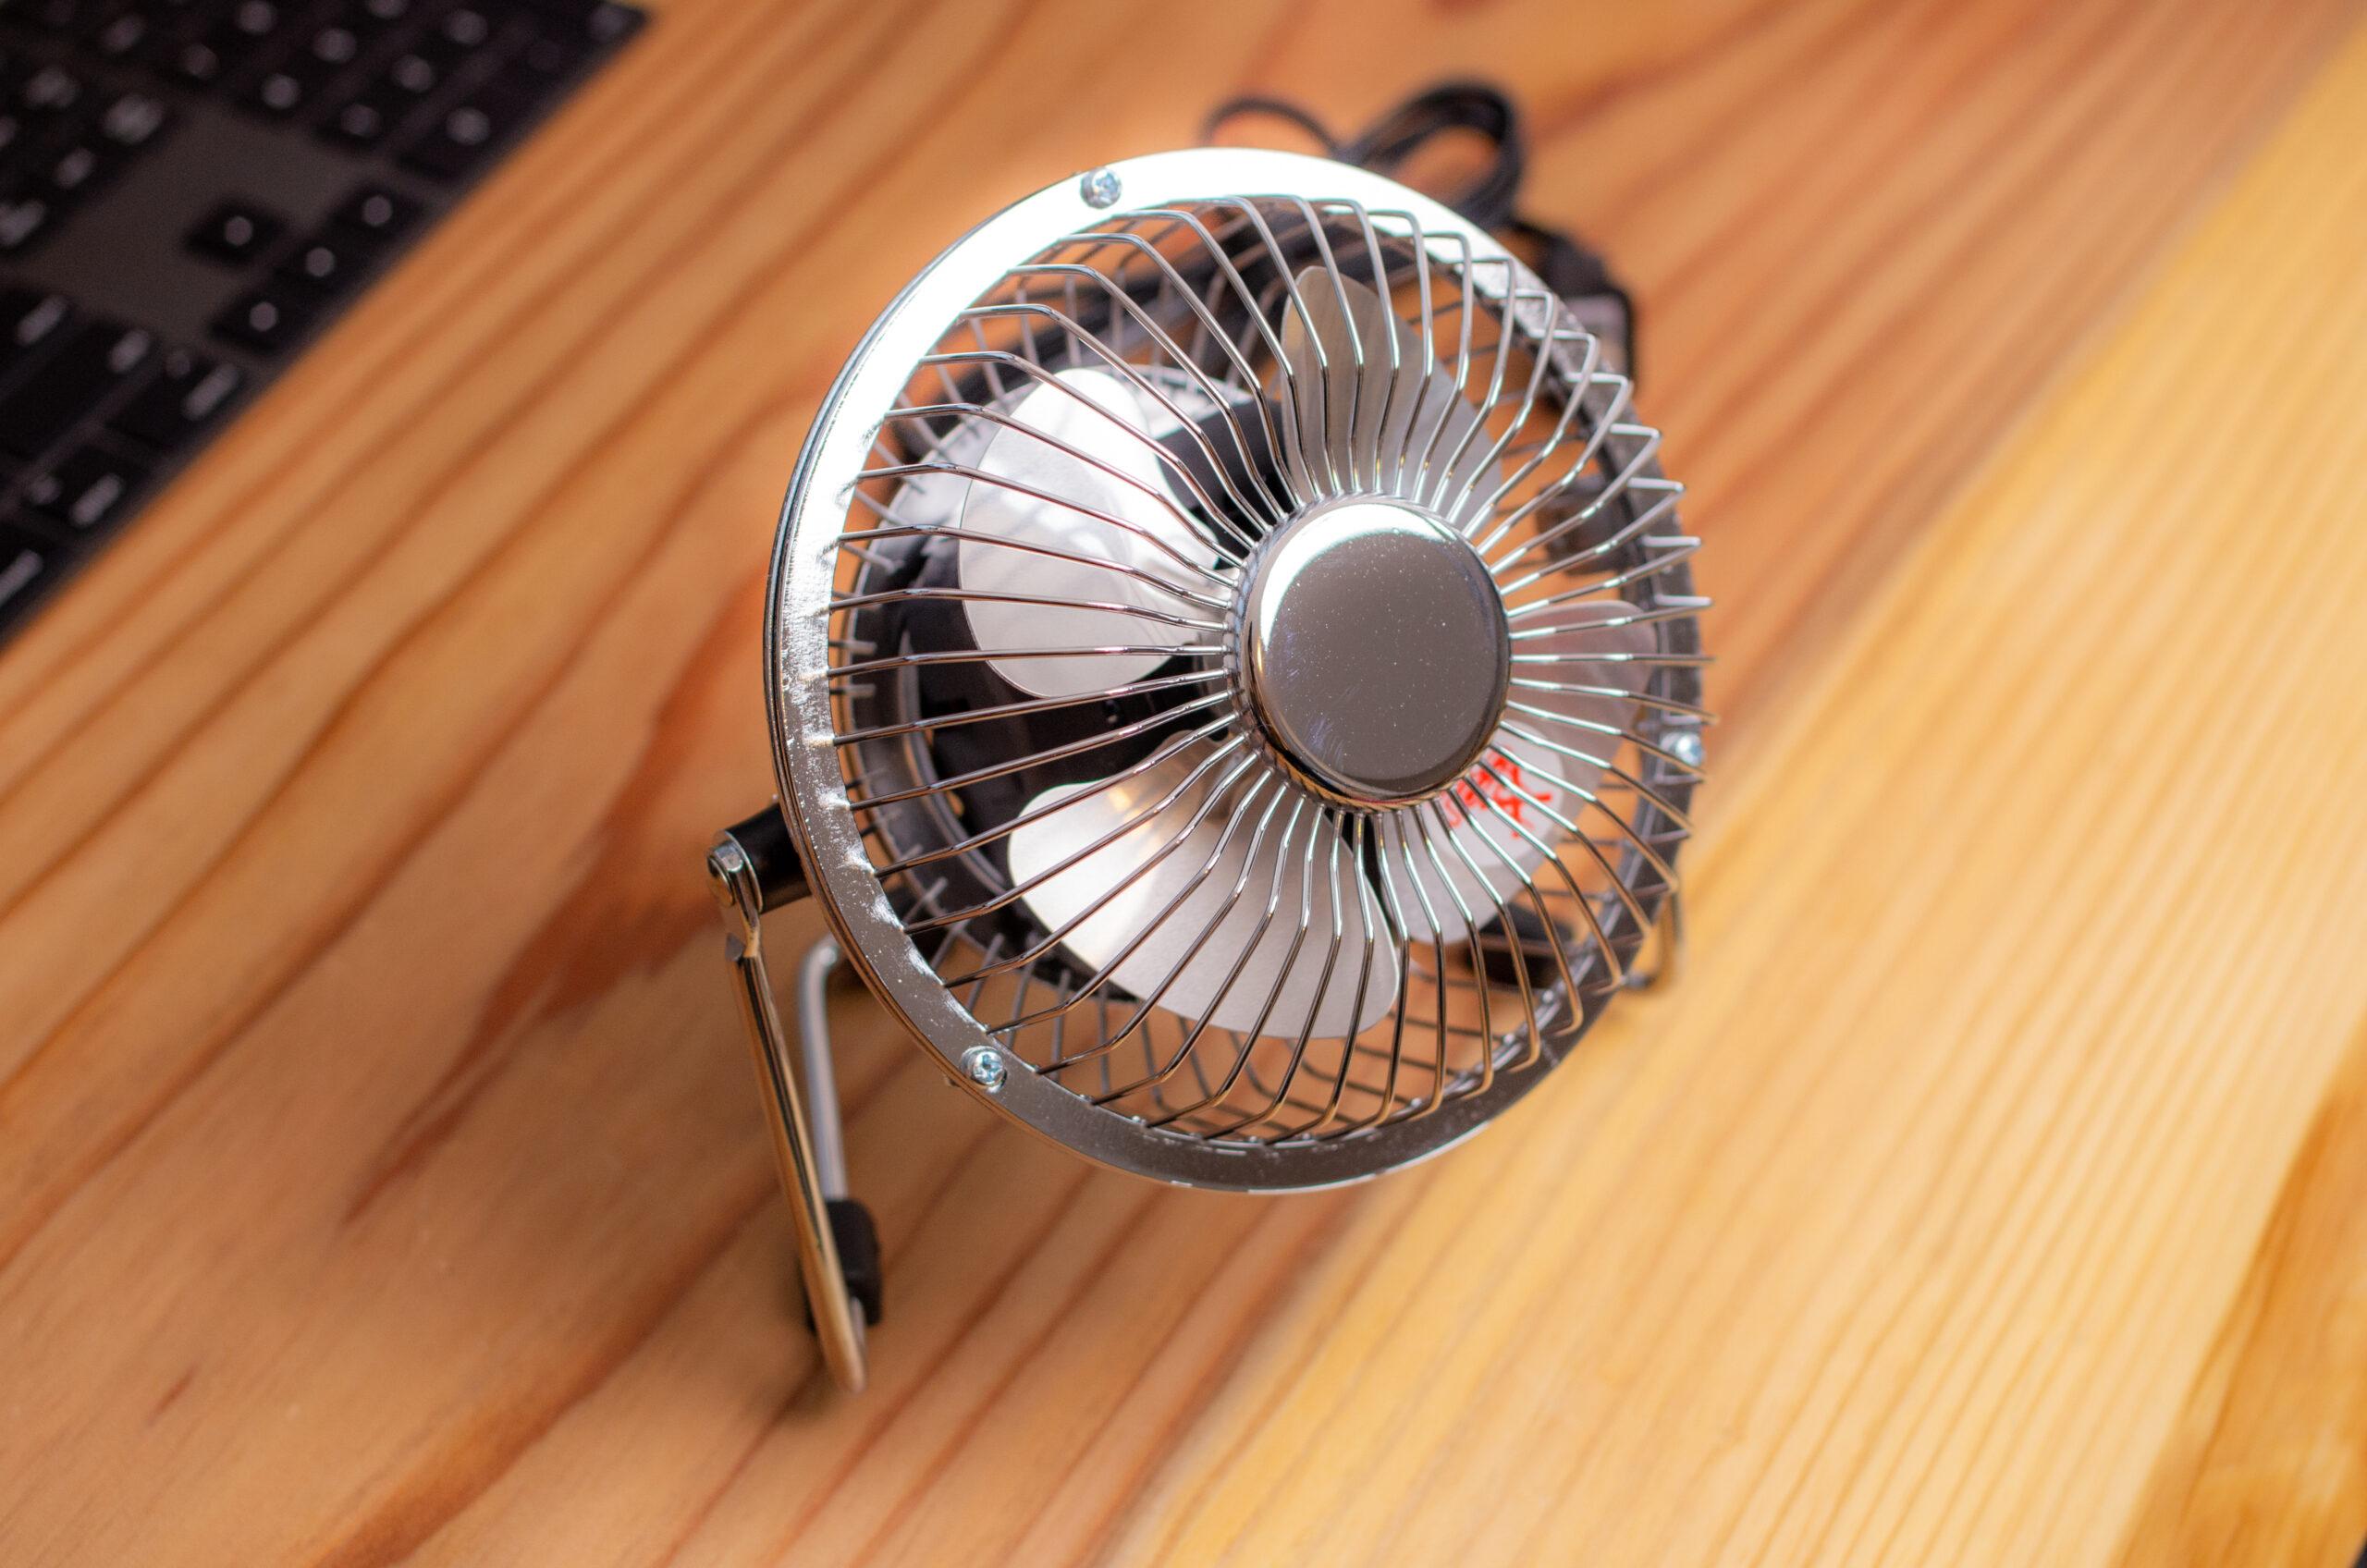 NICOH マグネットファン NA MF103 磁石付き卓上扇風機【レビュー】